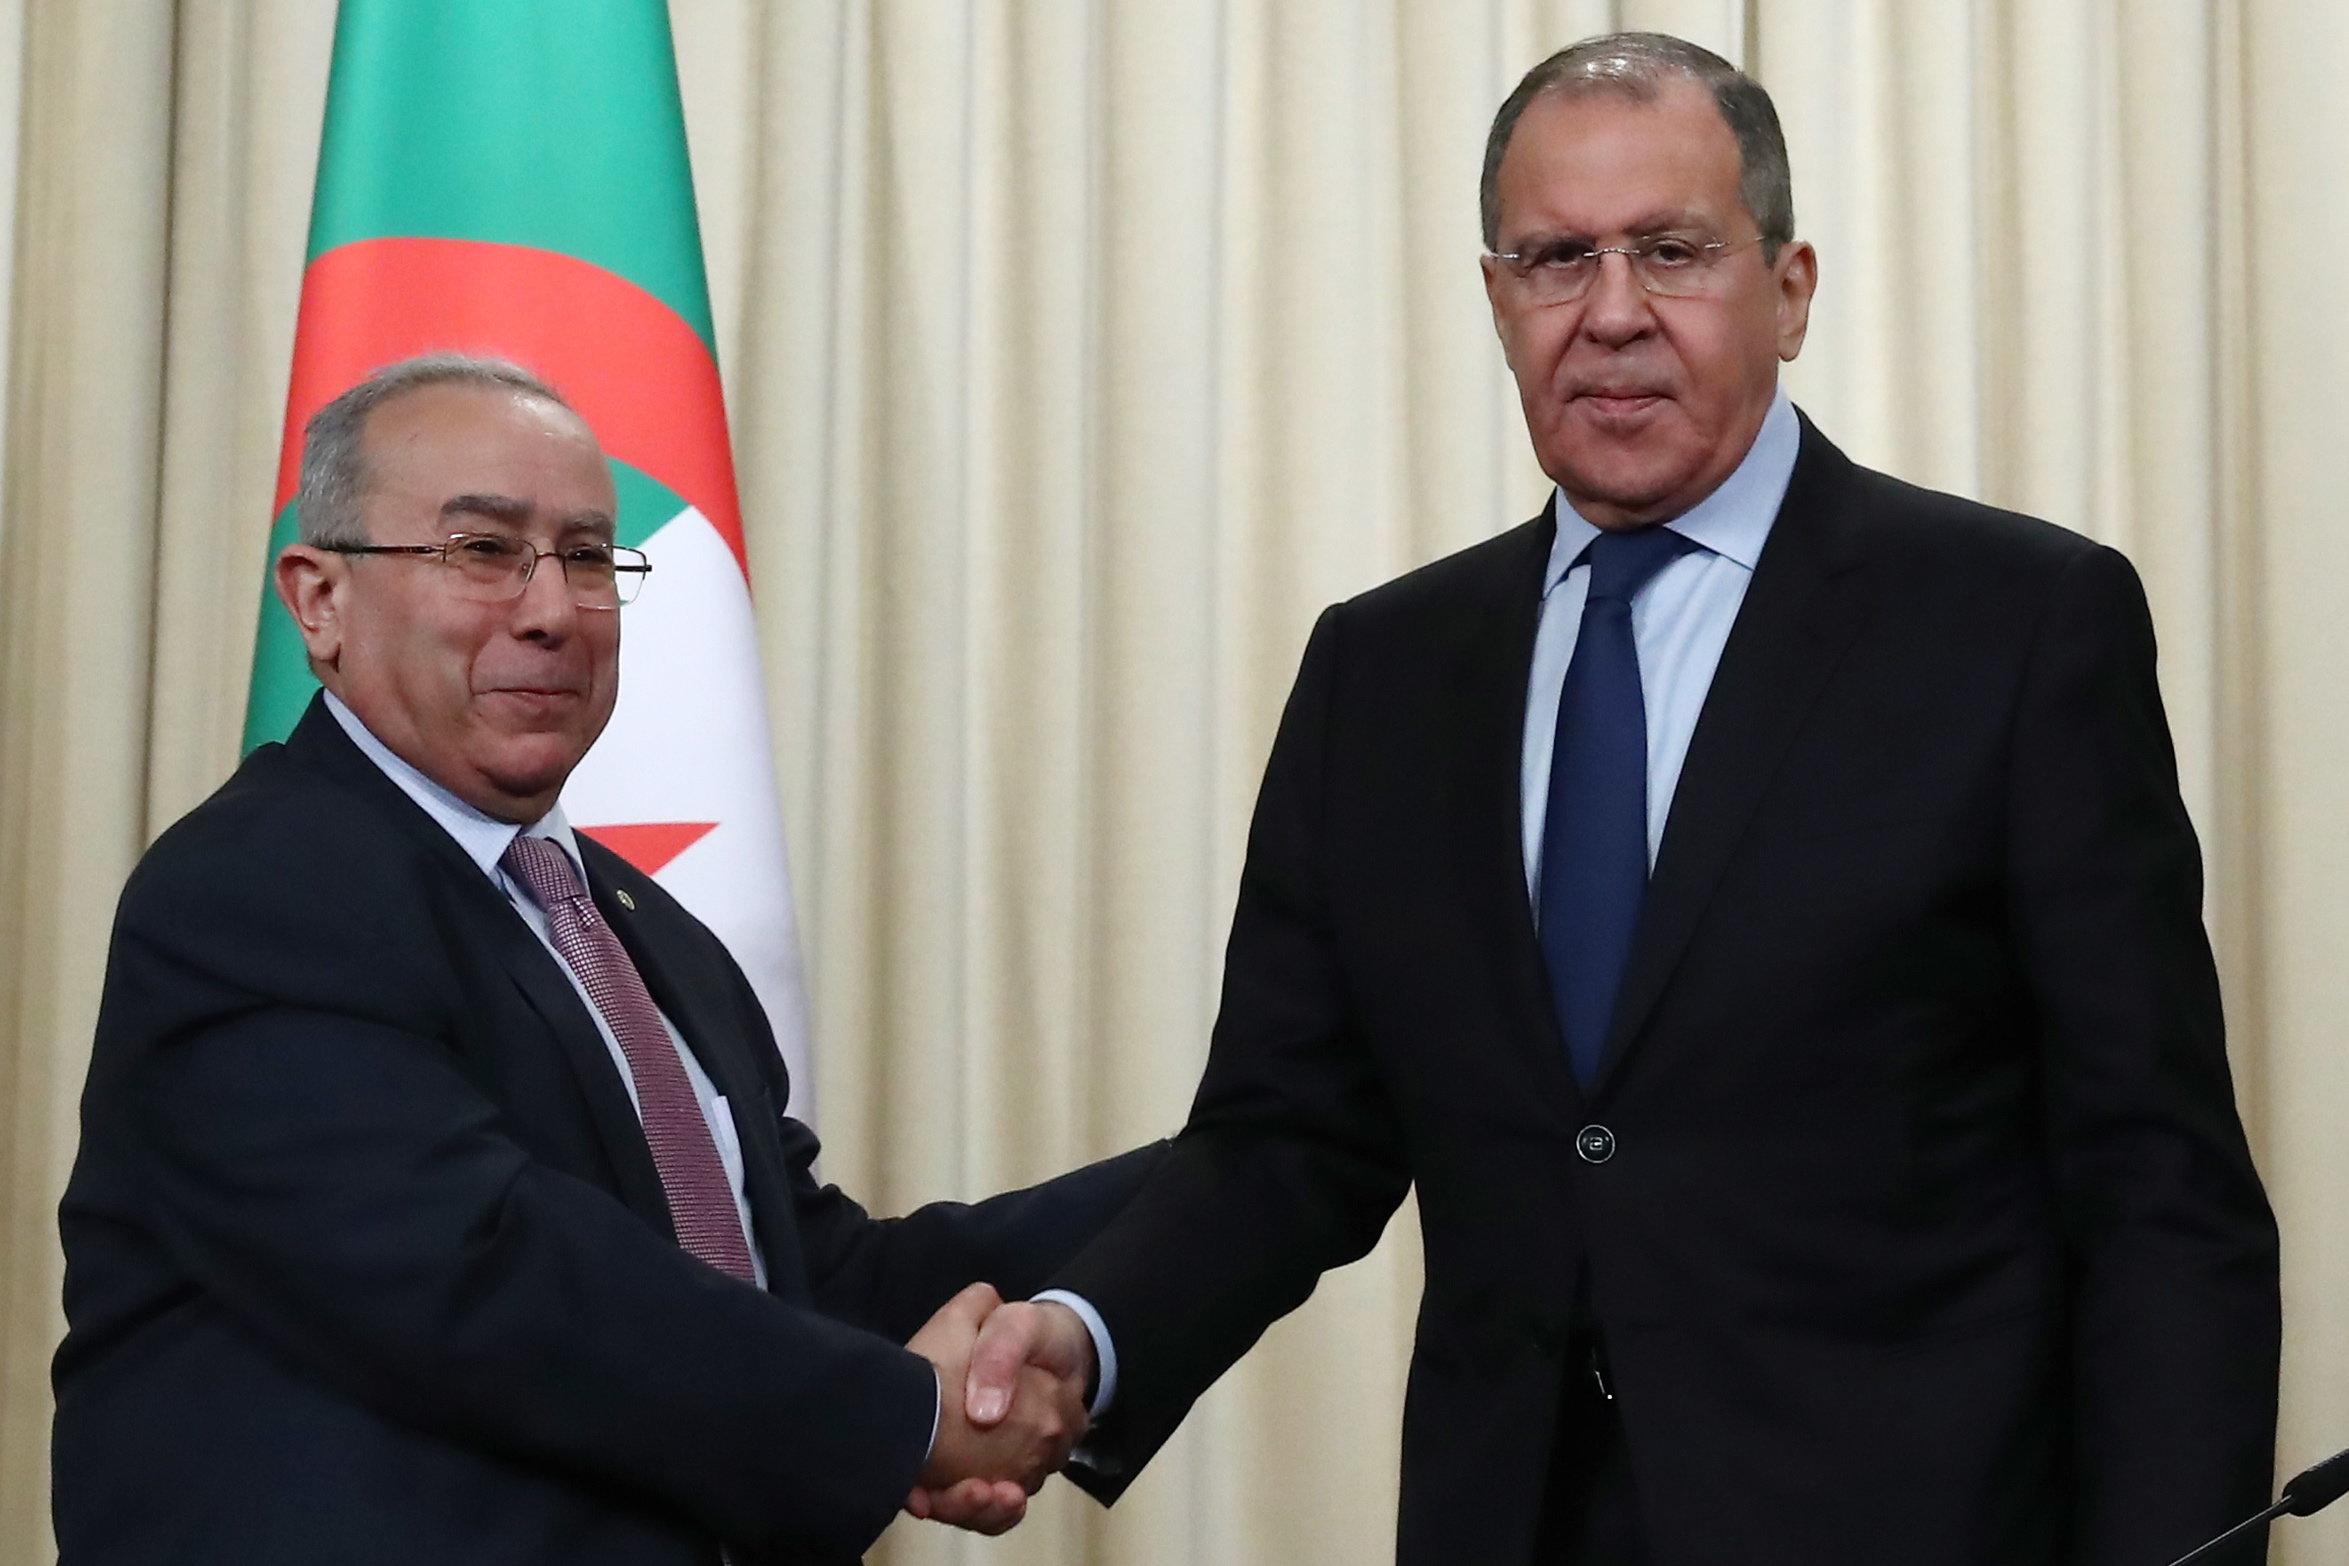 Conférence de presse conjointe Lamamra et Lavrov: